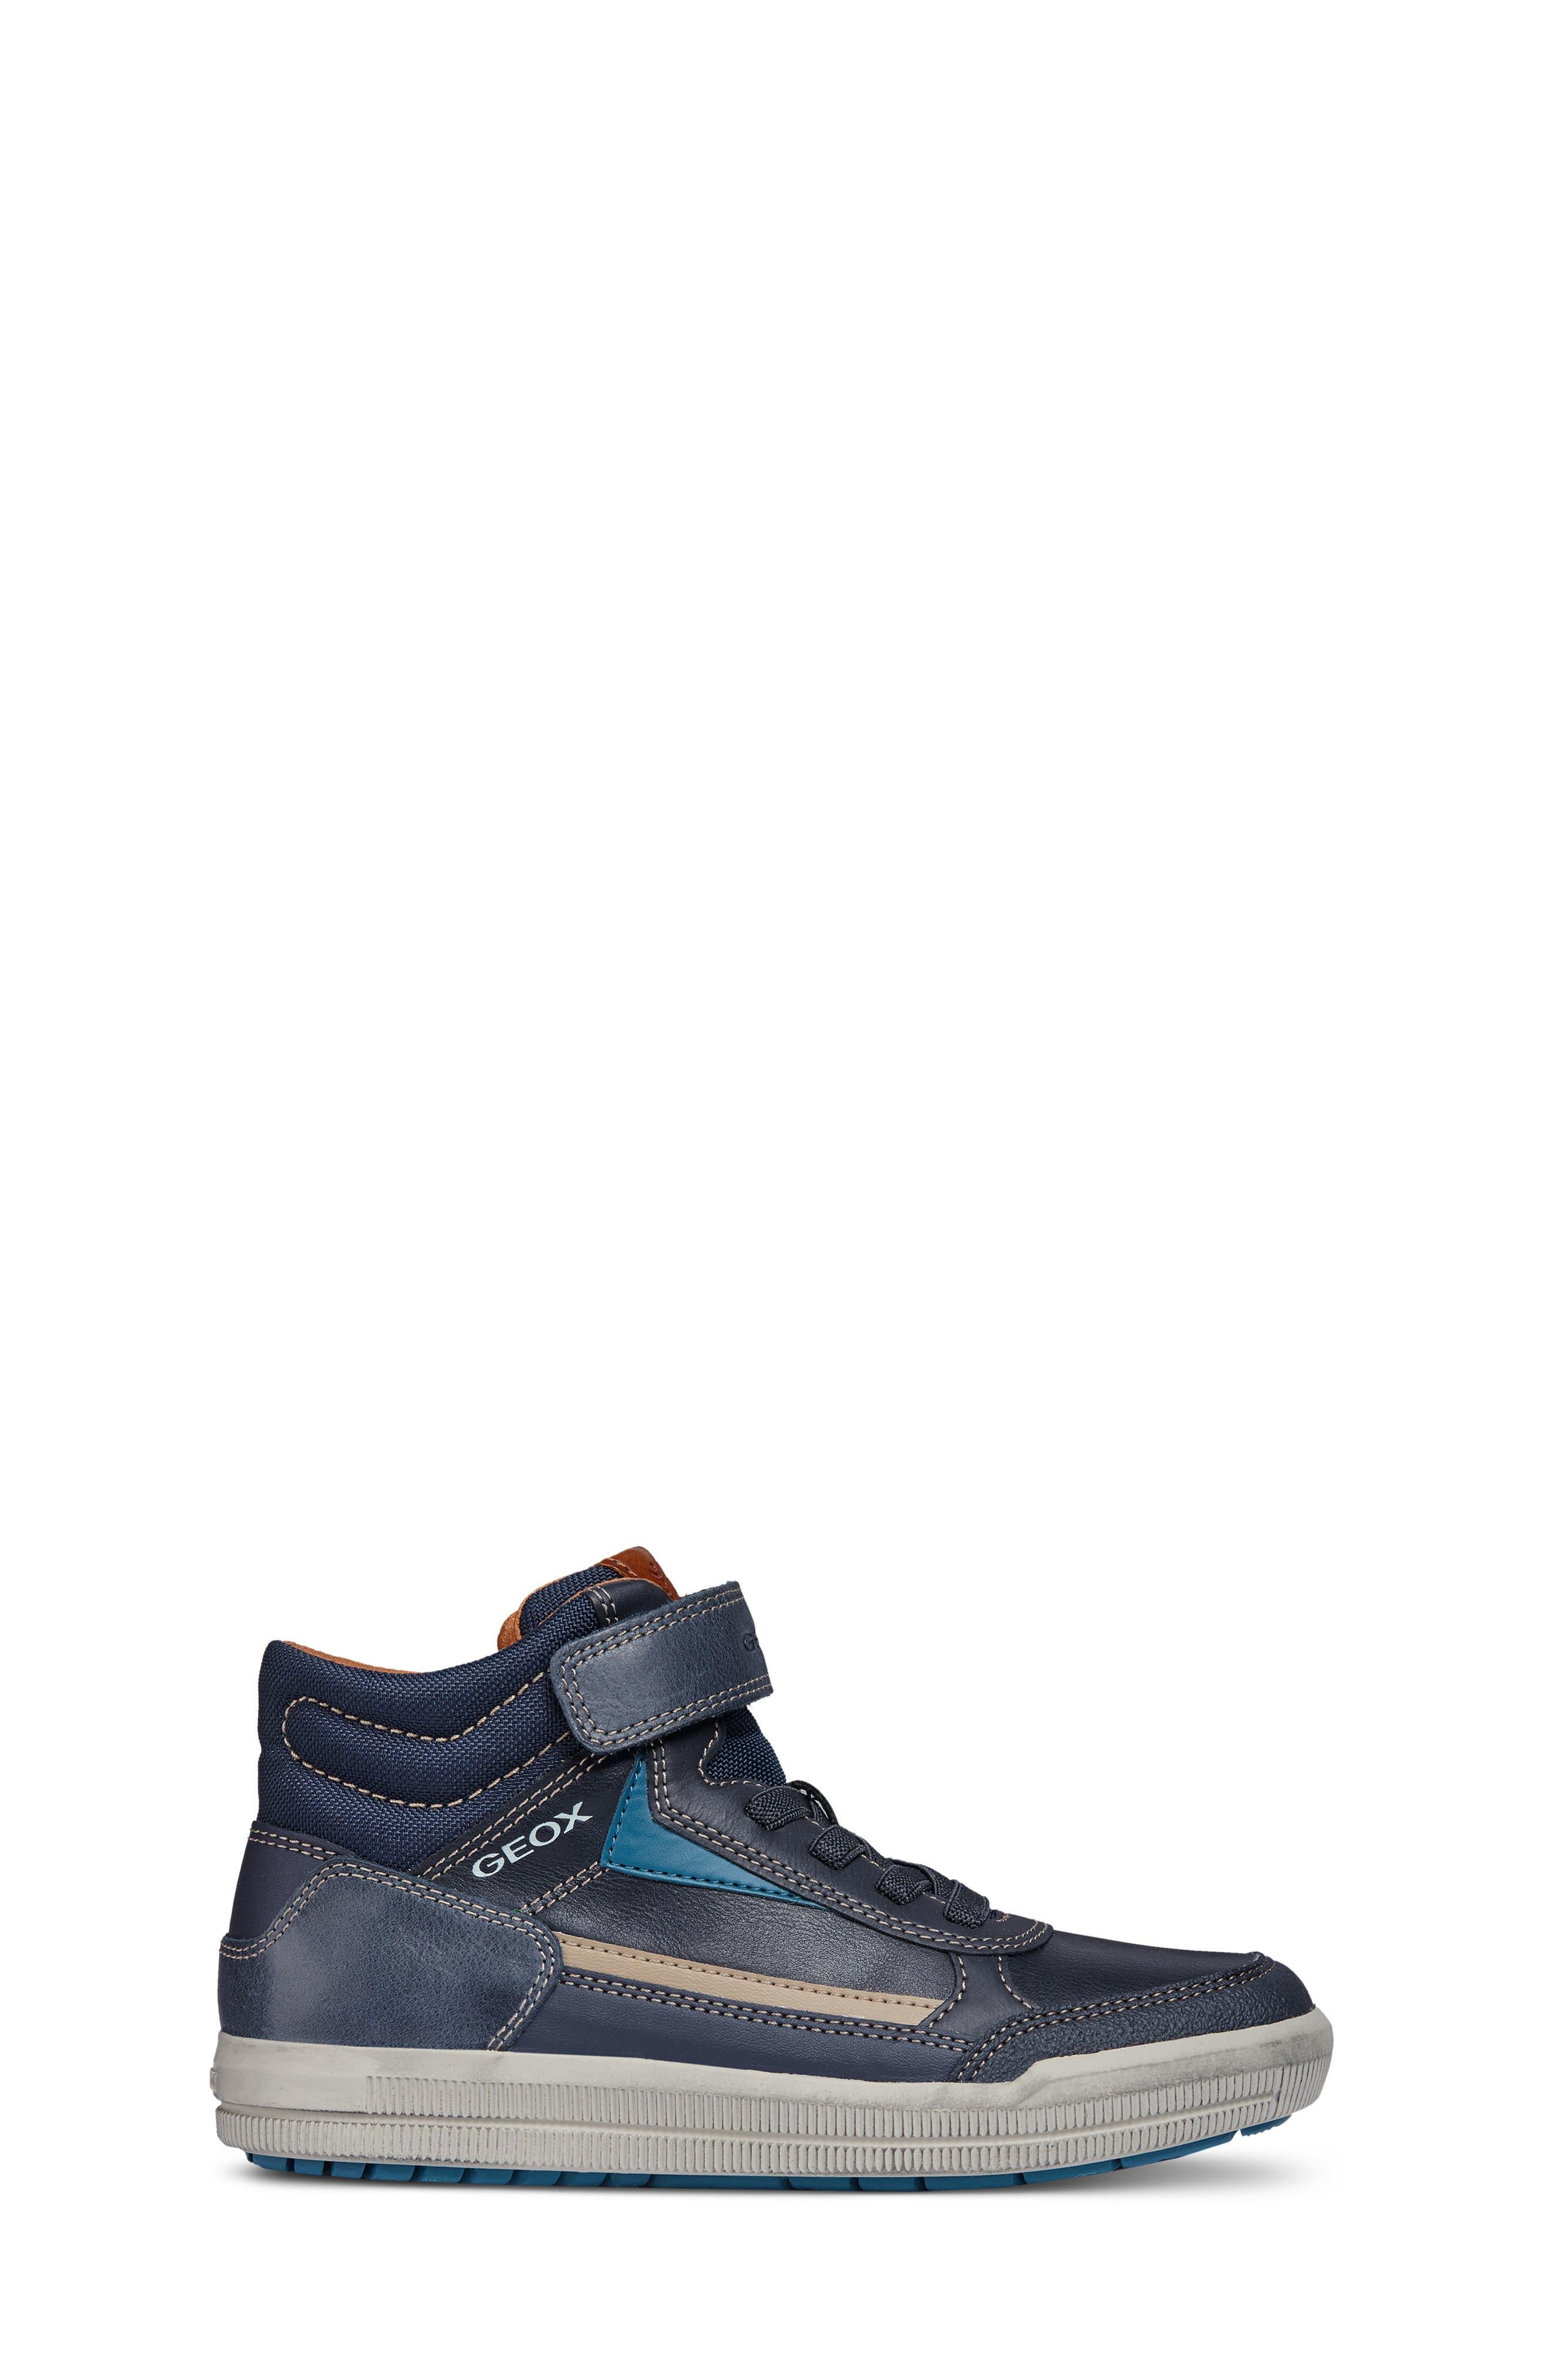 Arzach Mid Top Sneaker,                             Alternate thumbnail 6, color,                             Navy/Petrol